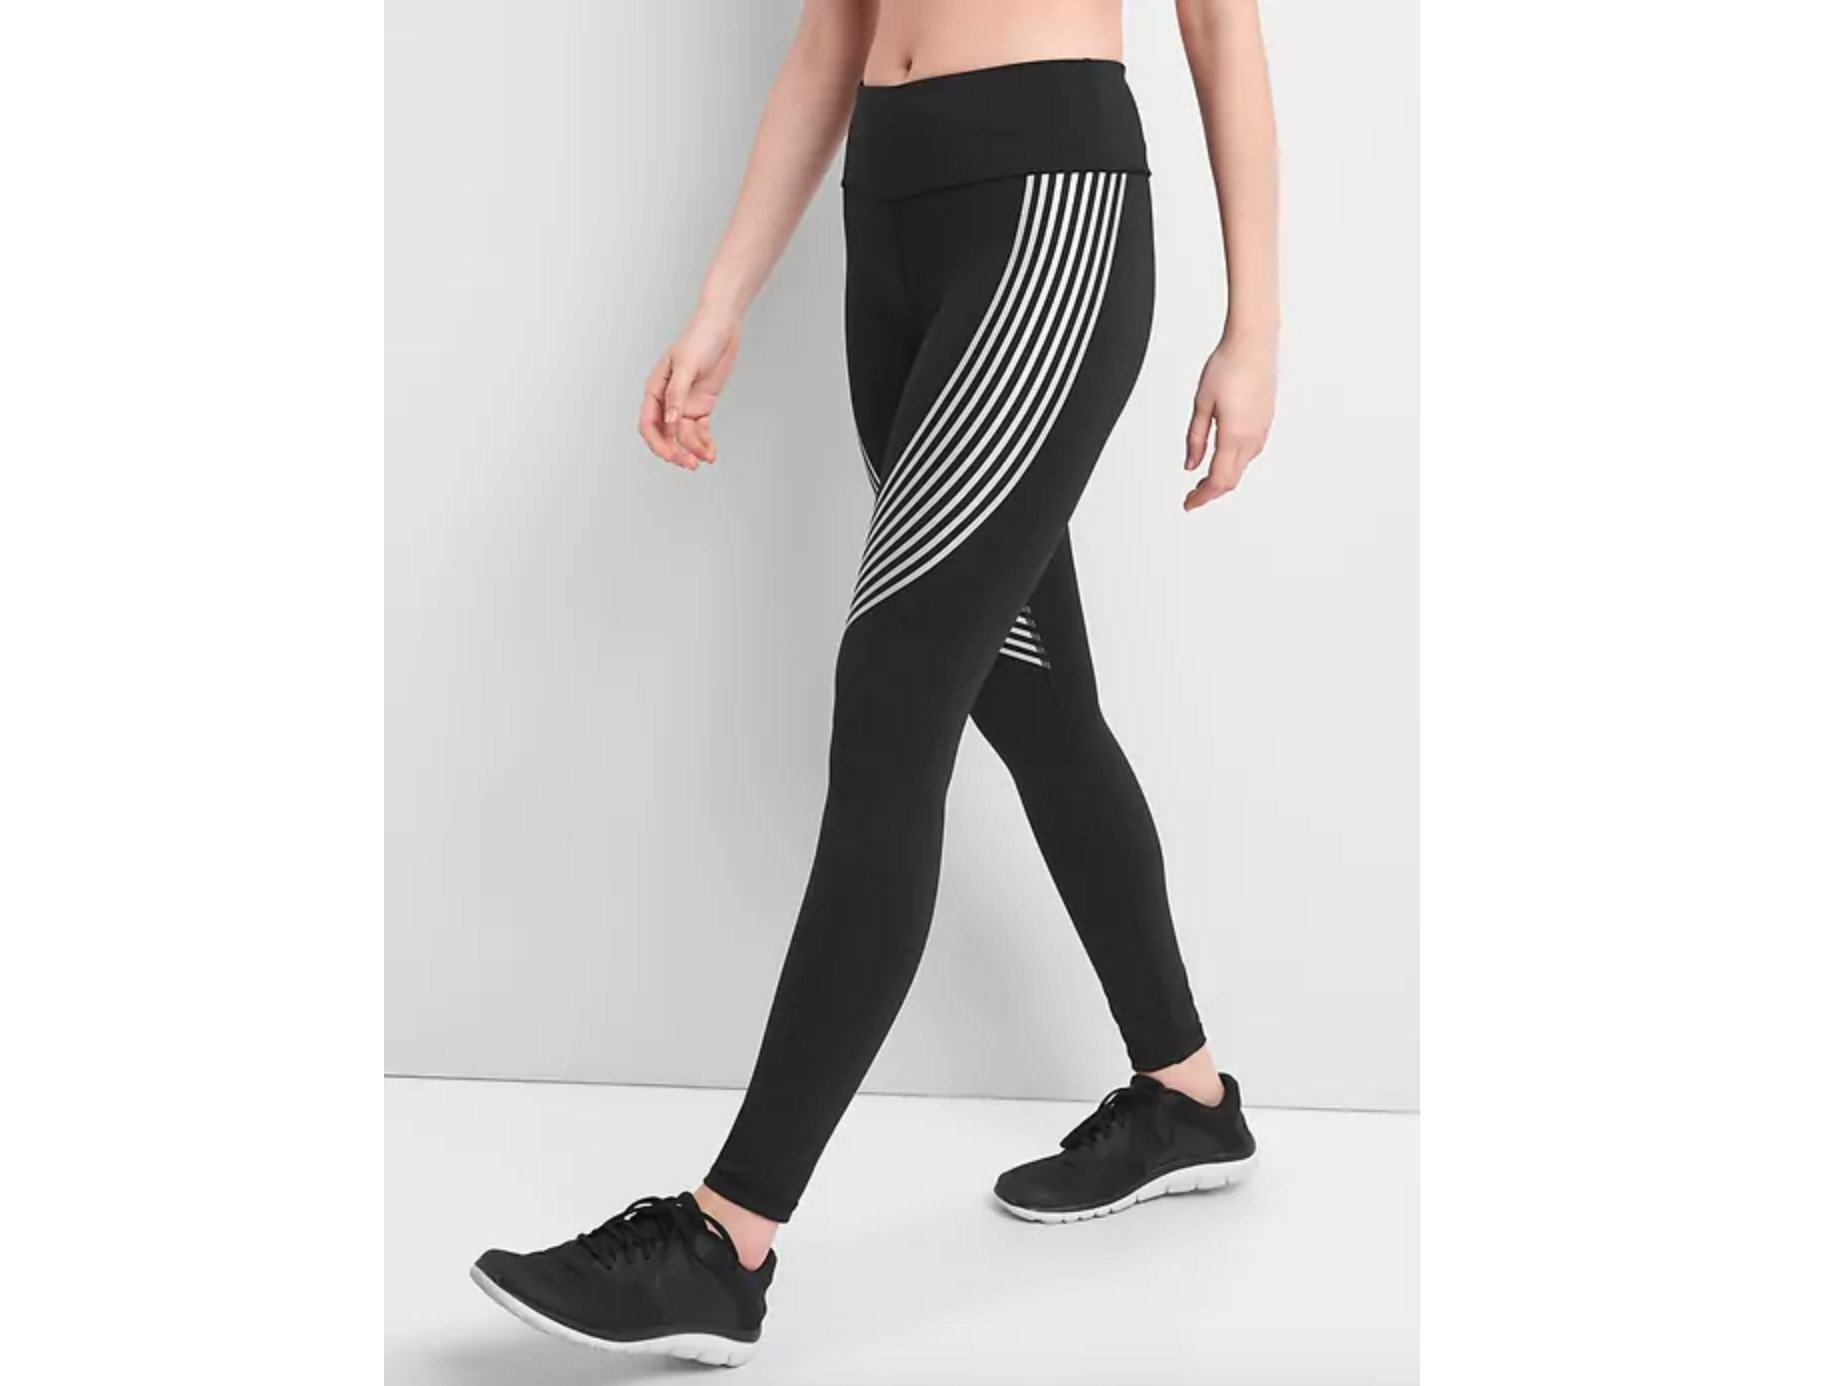 Health + Wellness Style + Design Travel Shop clothing person woman tights leggings waist human leg trousers abdomen active pants active undergarment joint female trouser